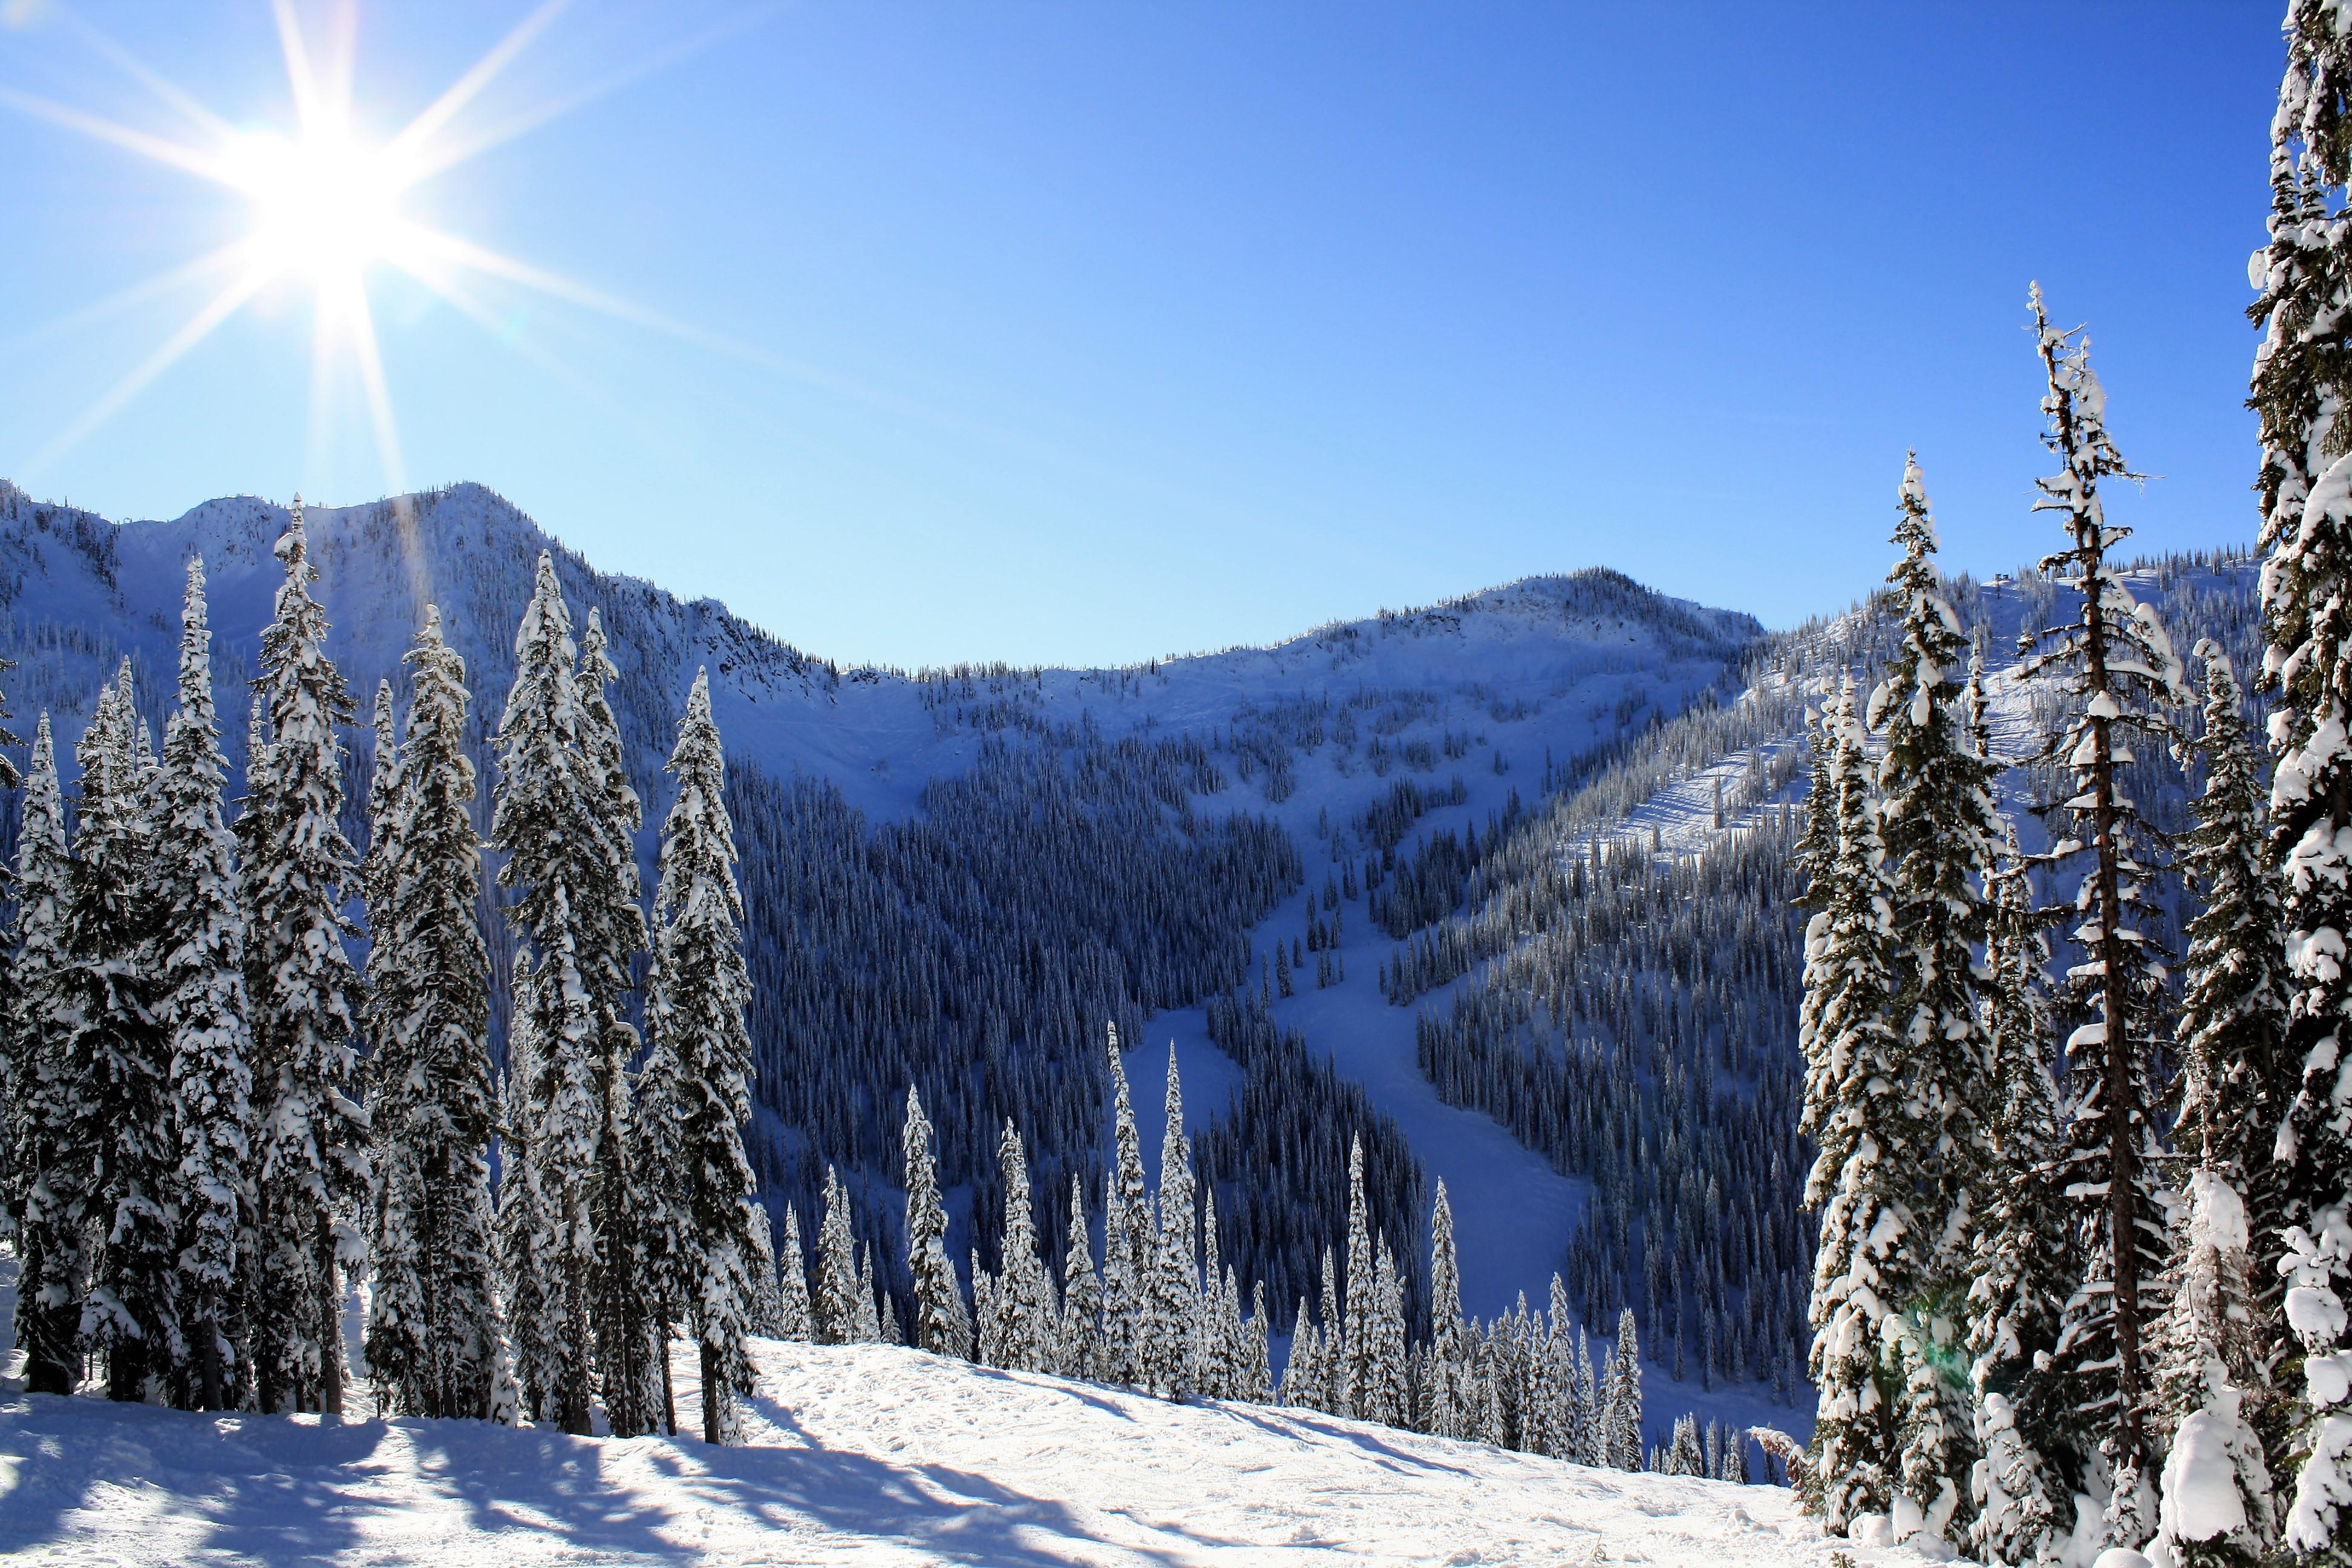 DM_nature_winter_kootenays_7999